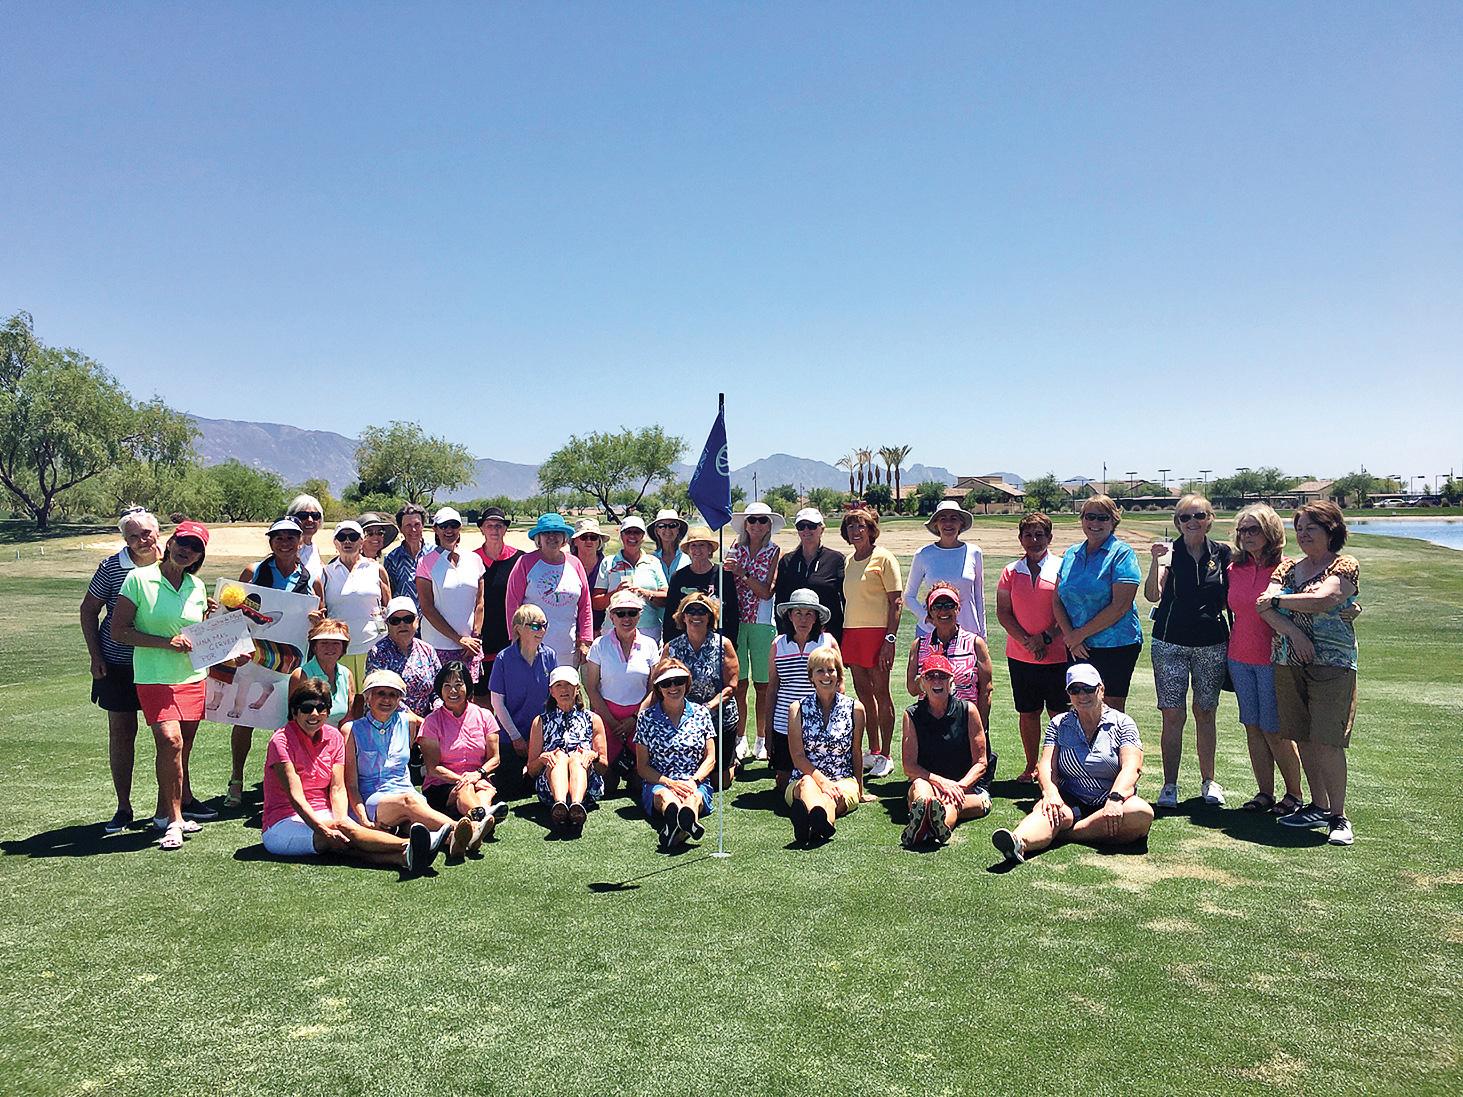 The ladies of SBRWGA celebrate Cuatro de Mayo golf together.